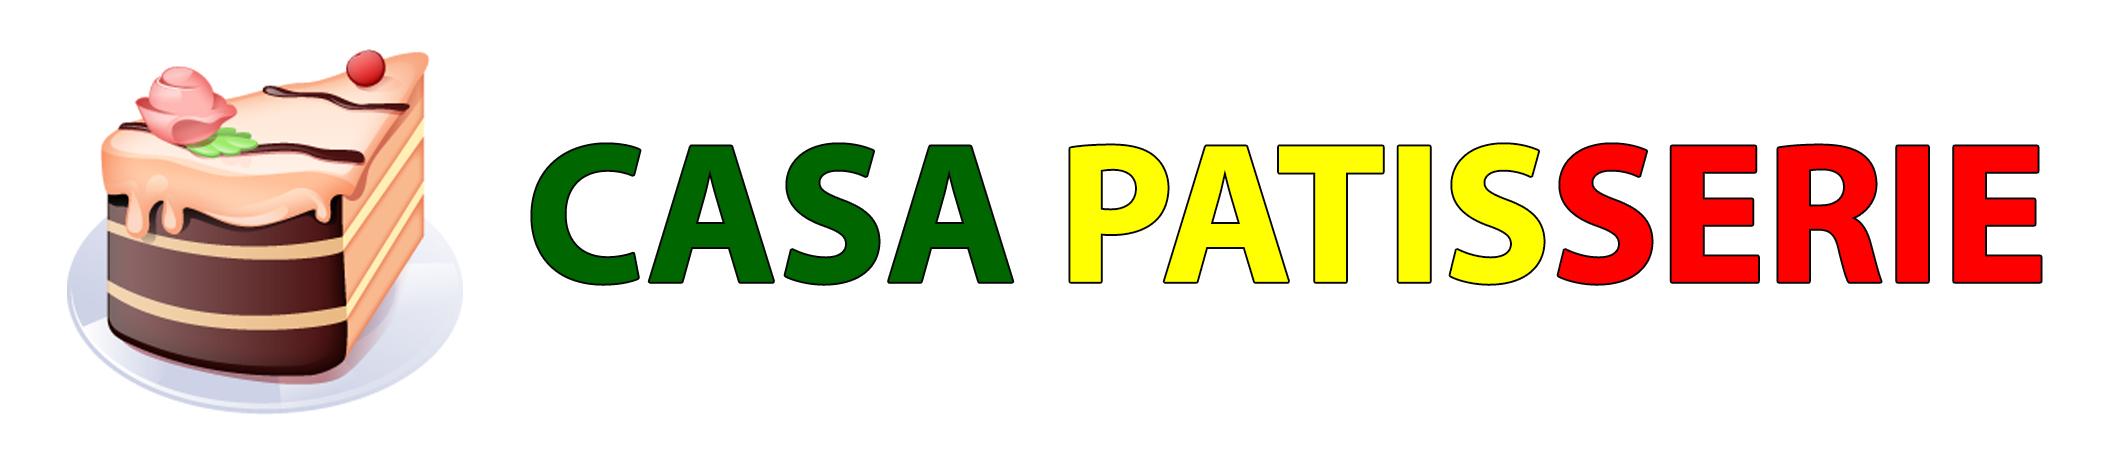 Patisserie - Casa Dos Frangos - In Portugalia